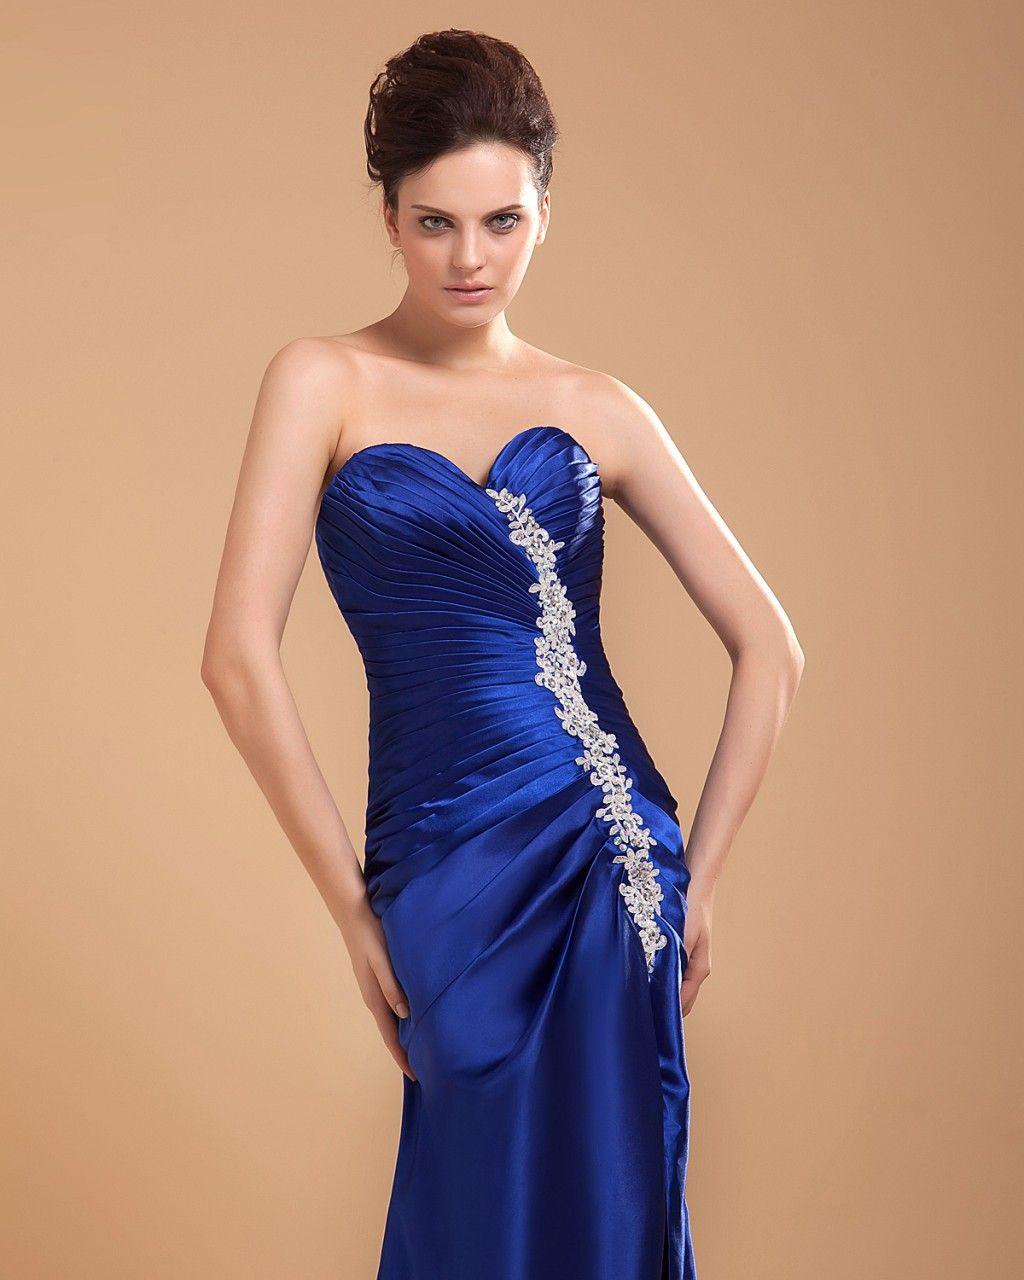 Amazing royal blue dress for women ideas dresses pinterest